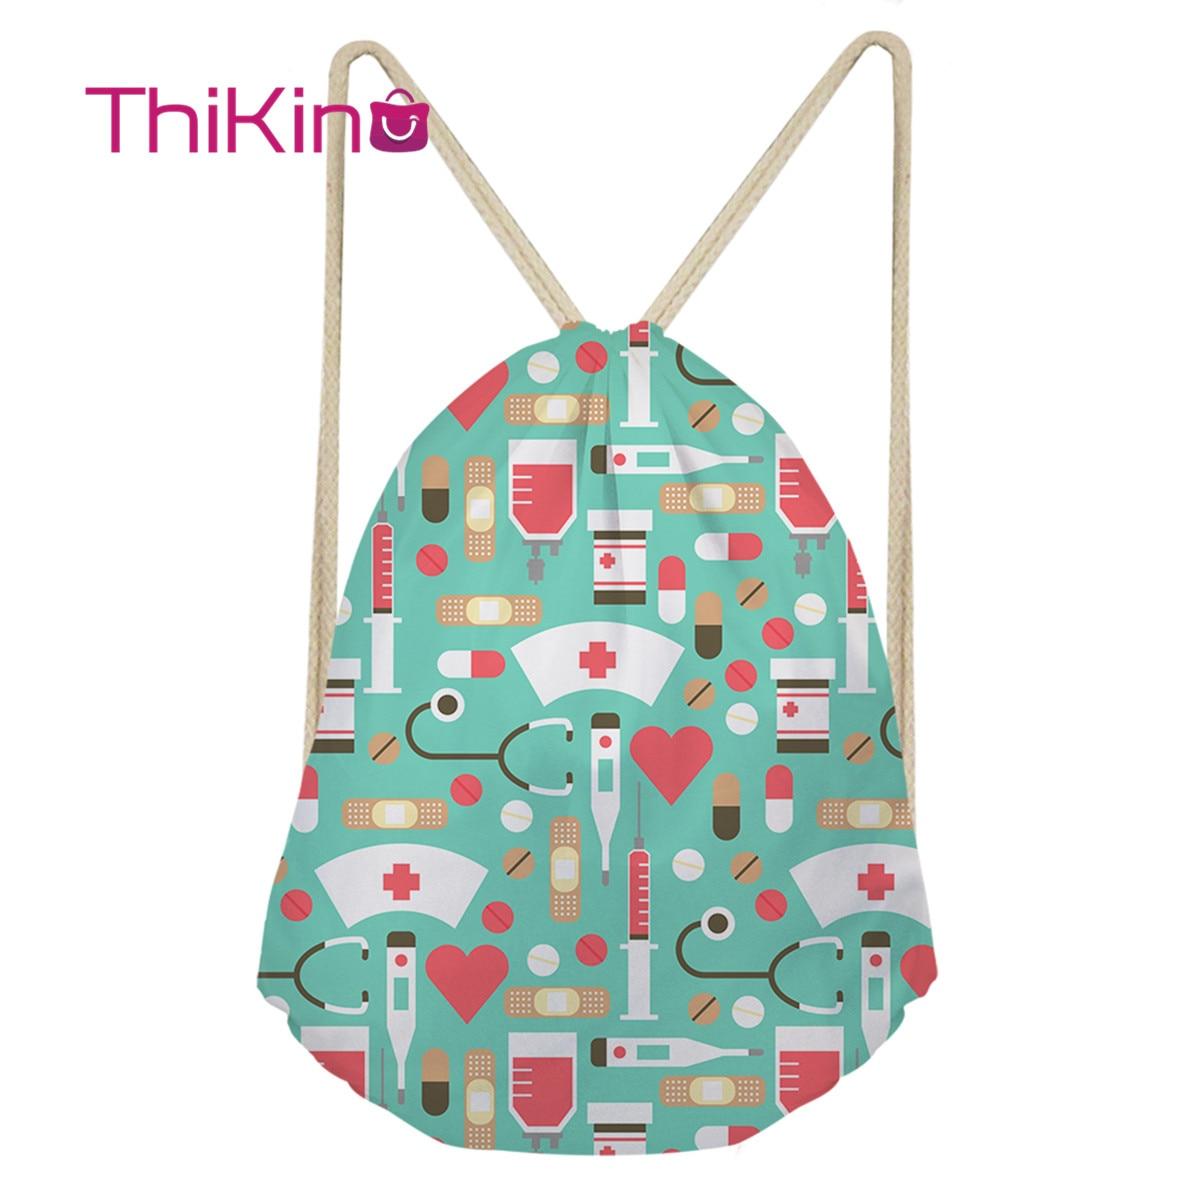 Thikin Nursing Needle Casual Sack Drawstring Bag For Women Travel Backpack Toddler Softback Lady Beach Mochila DrawString Bag